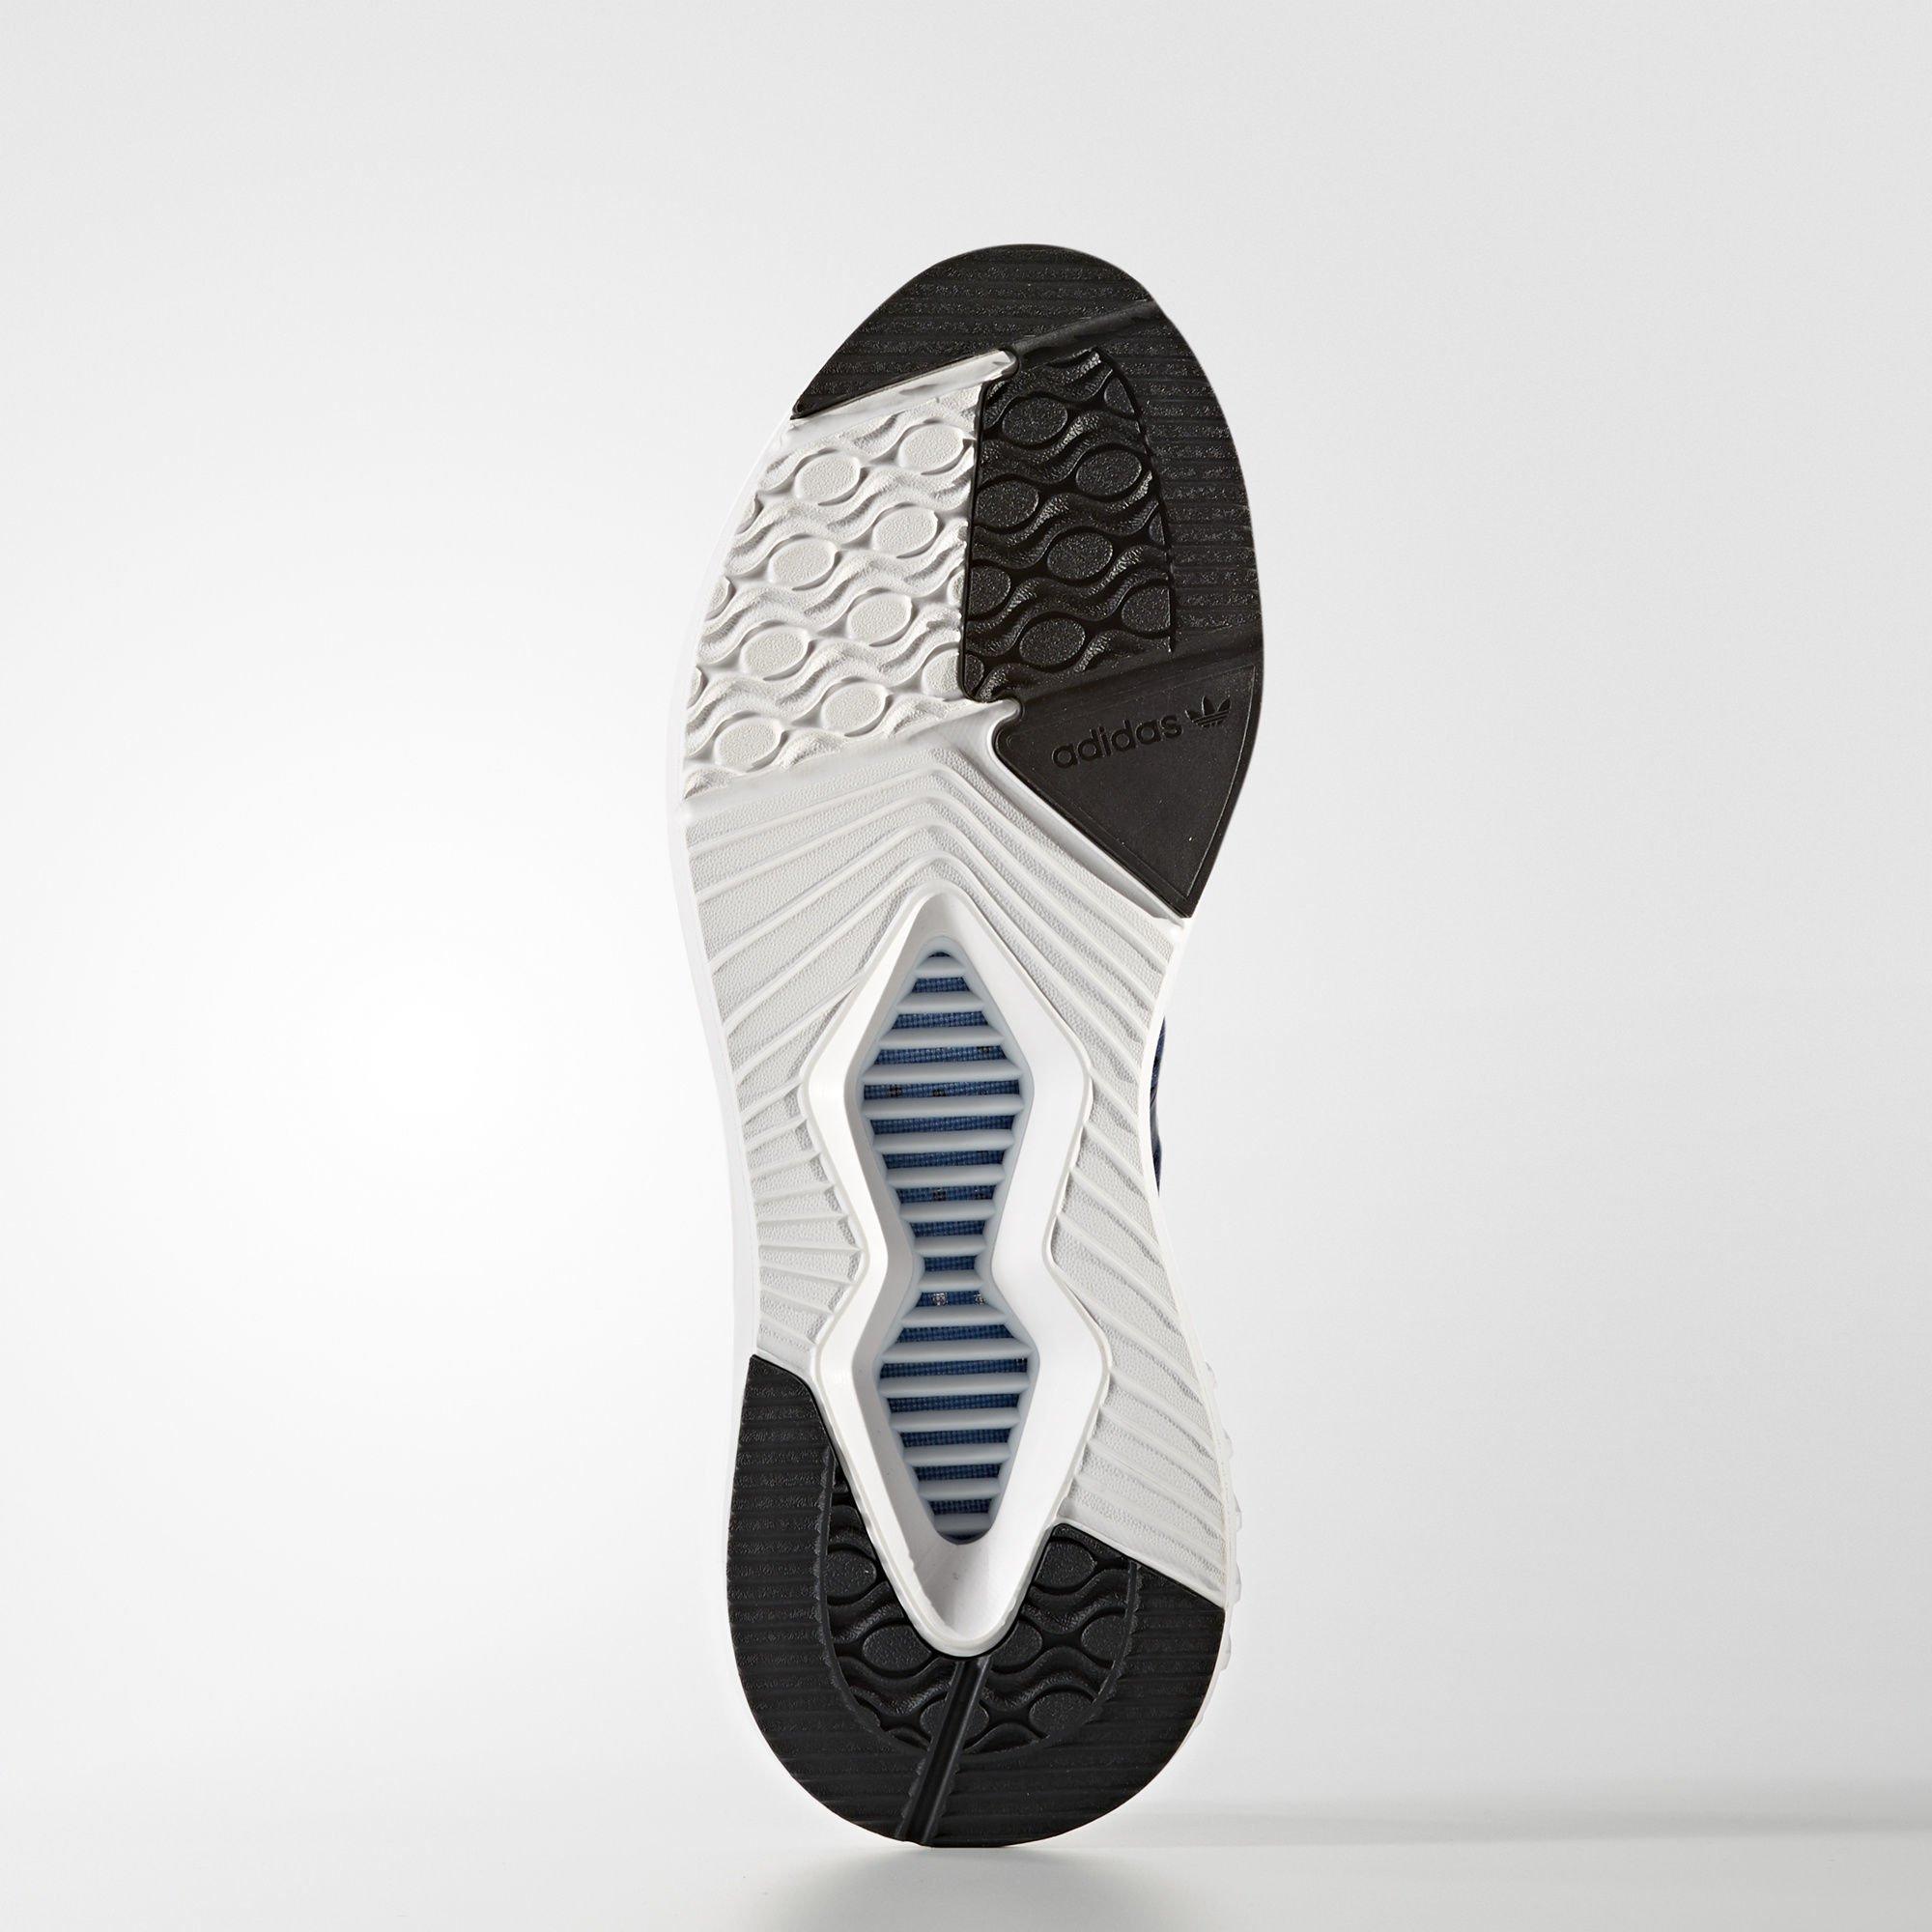 Adidas ClimaCool CG3342